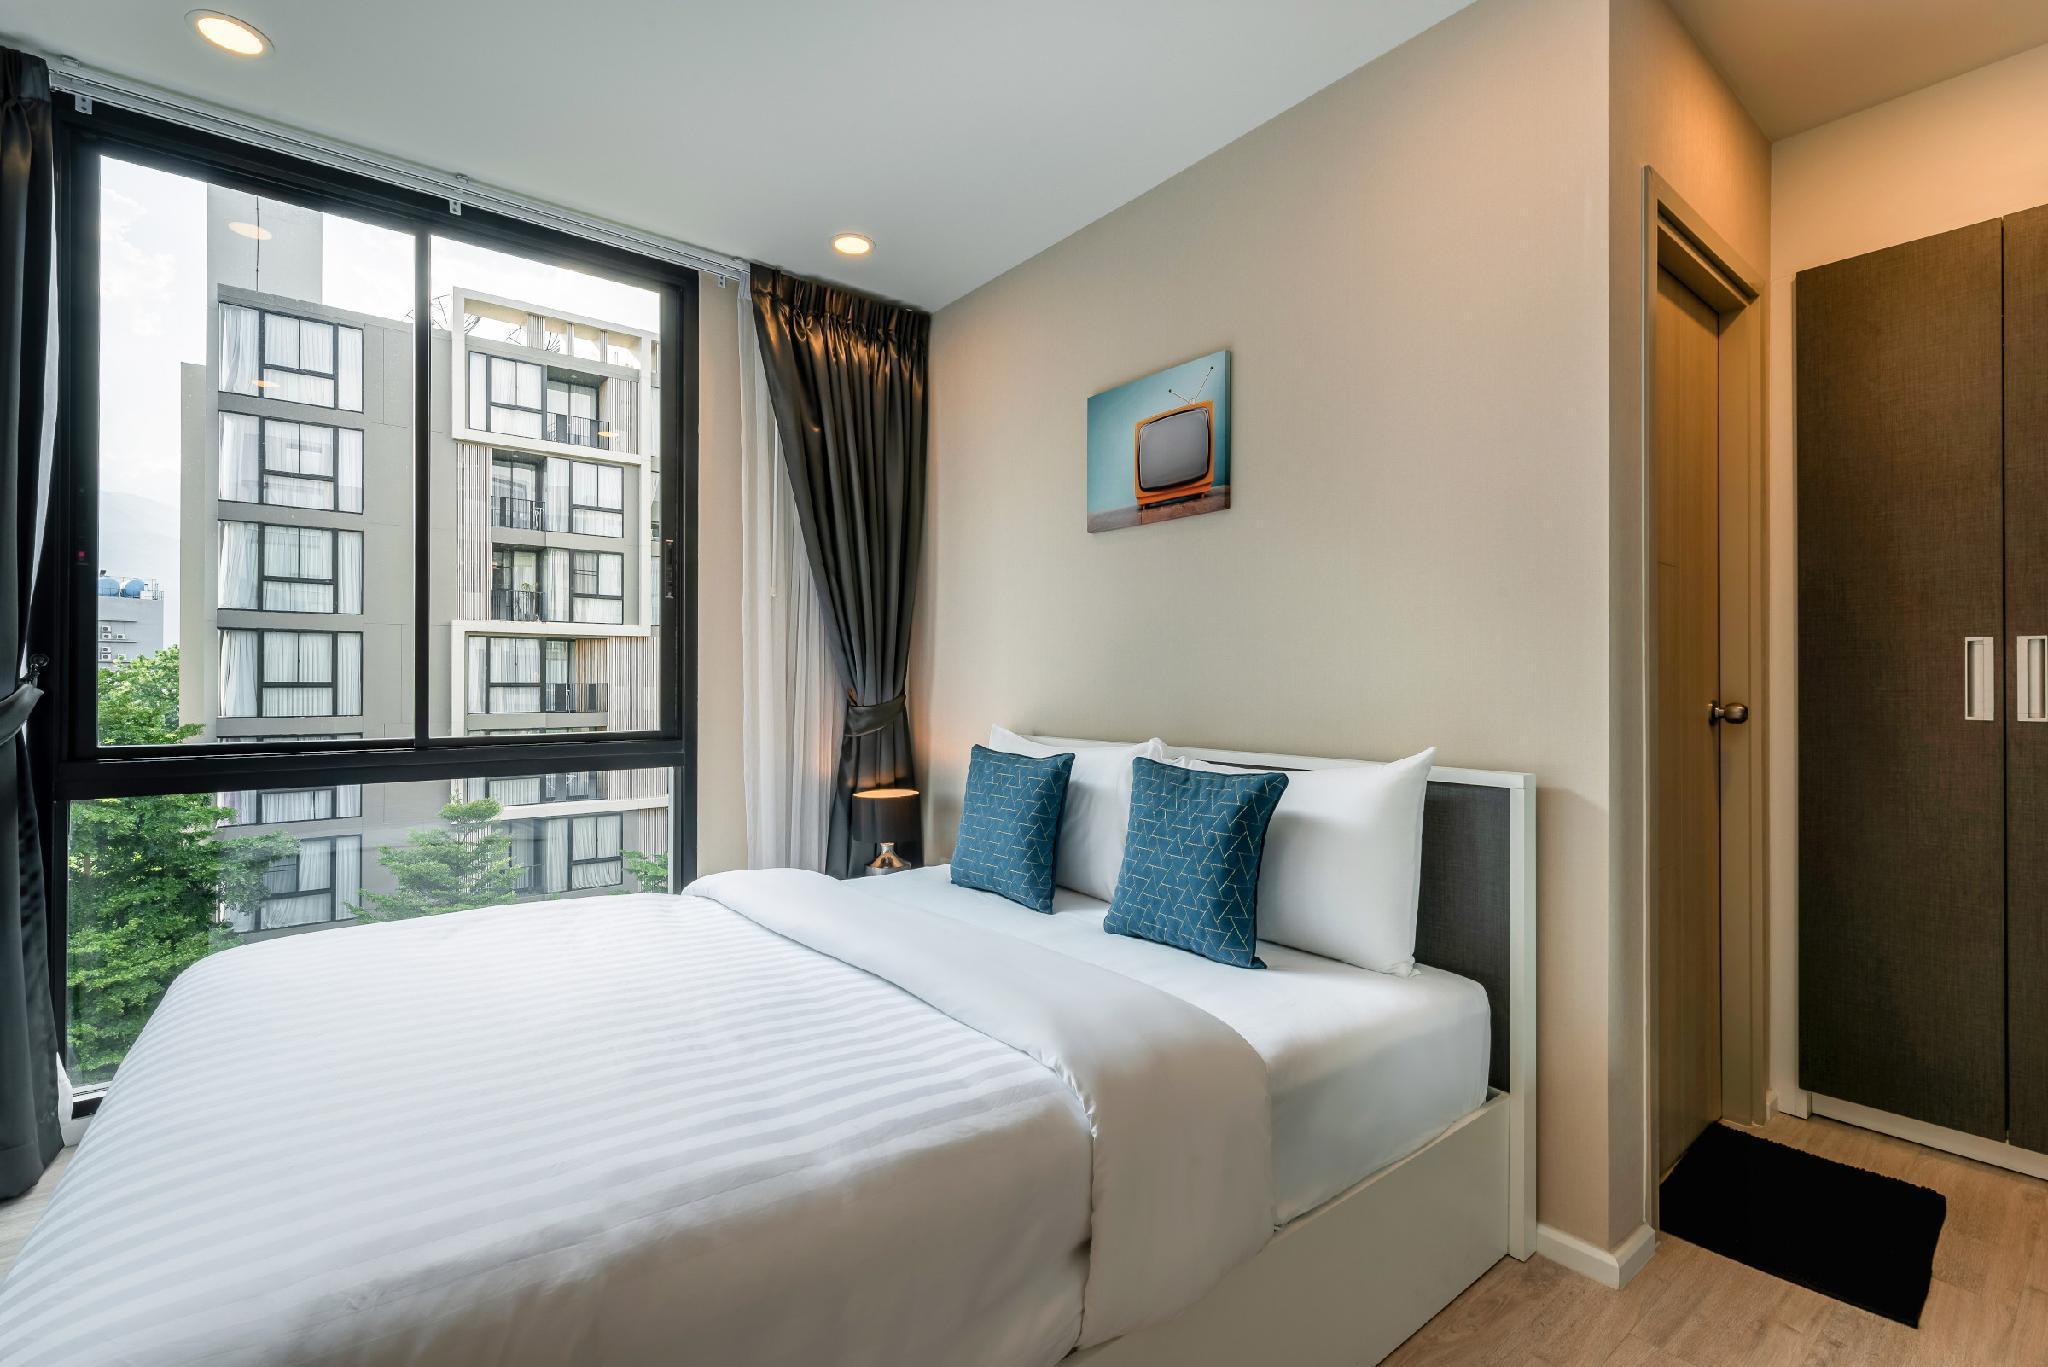 One Bedroom Suite in Nimman by Belcarra Spaces R51 อพาร์ตเมนต์ 1 ห้องนอน 1 ห้องน้ำส่วนตัว ขนาด 35 ตร.ม. – นิมมานเหมินทร์